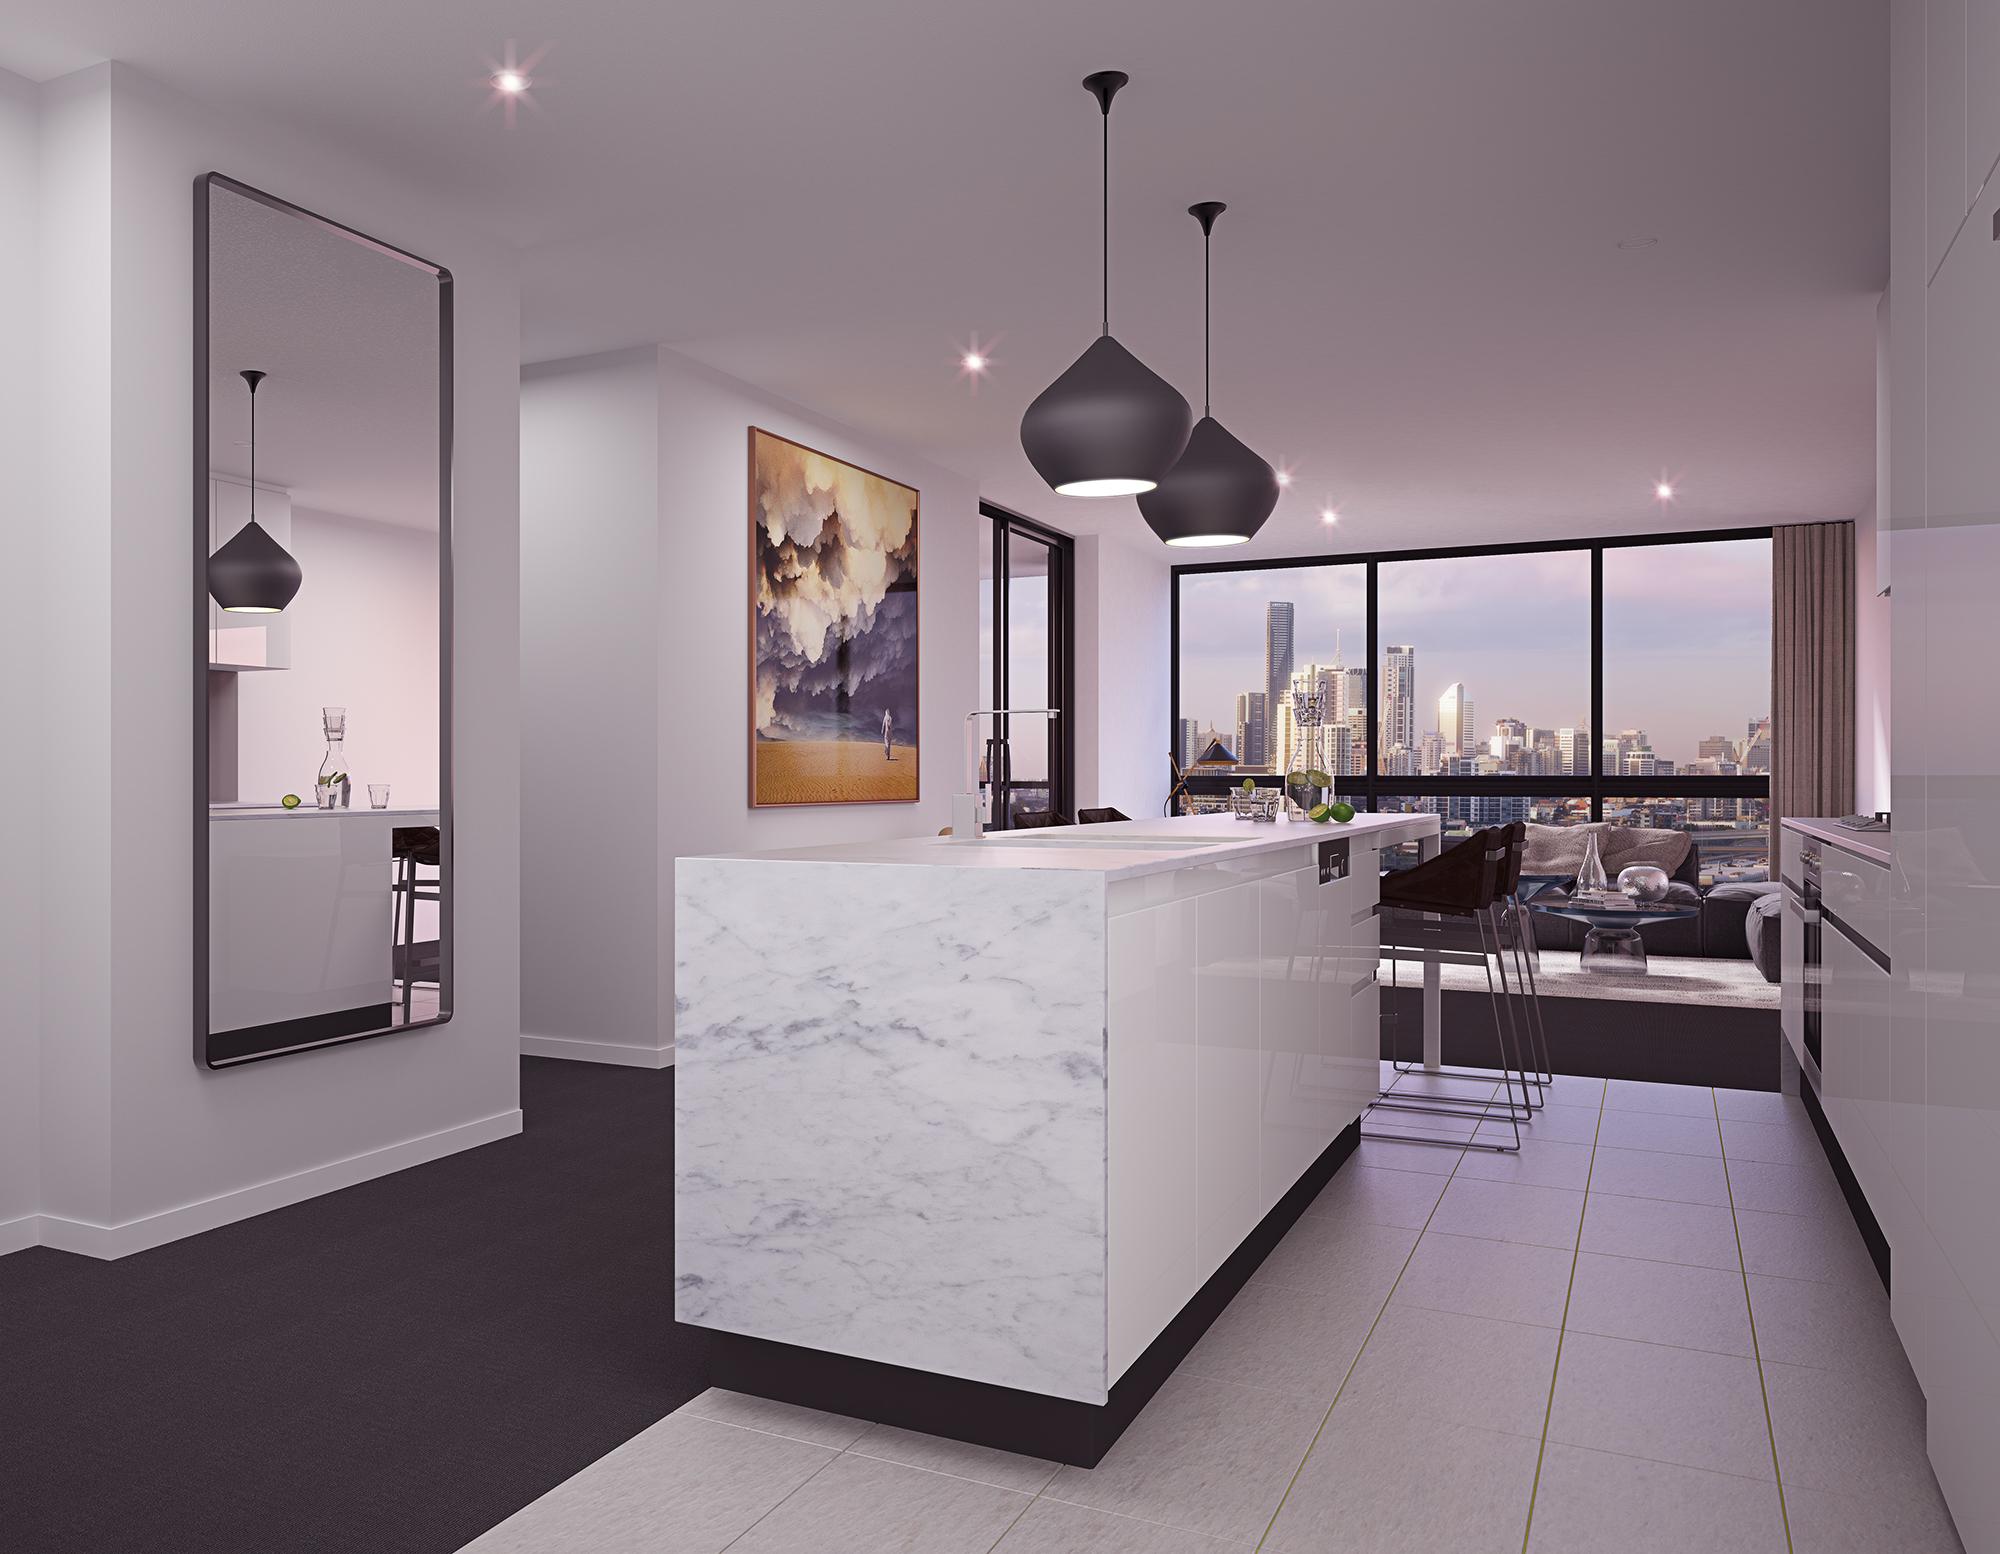 Albion - Hudson kitchen